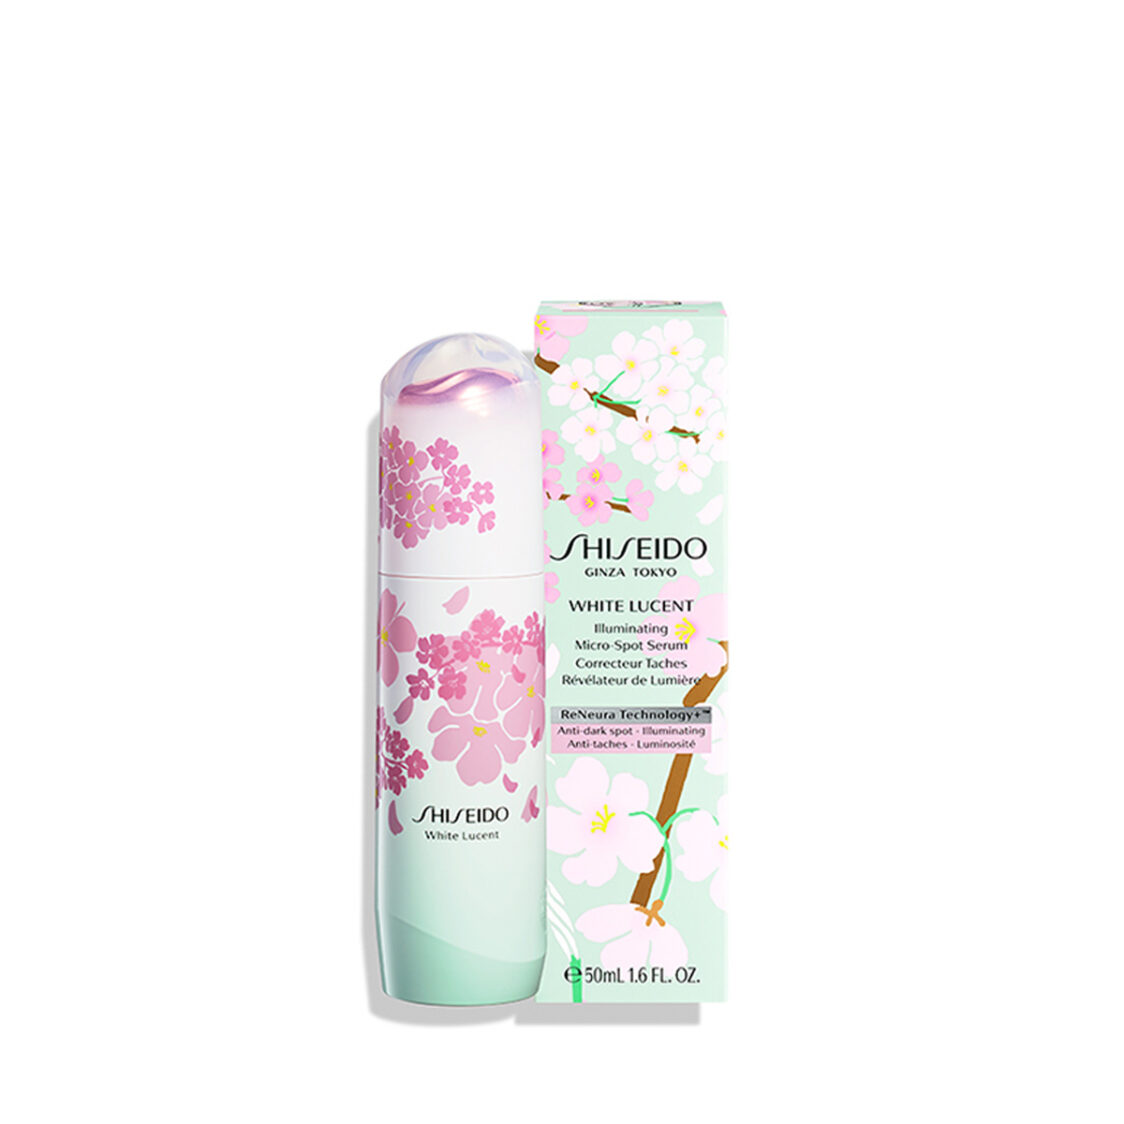 Shiseido White Lucent Illuminating Micro-Spot Serum 50ml Sakura Limited Edition